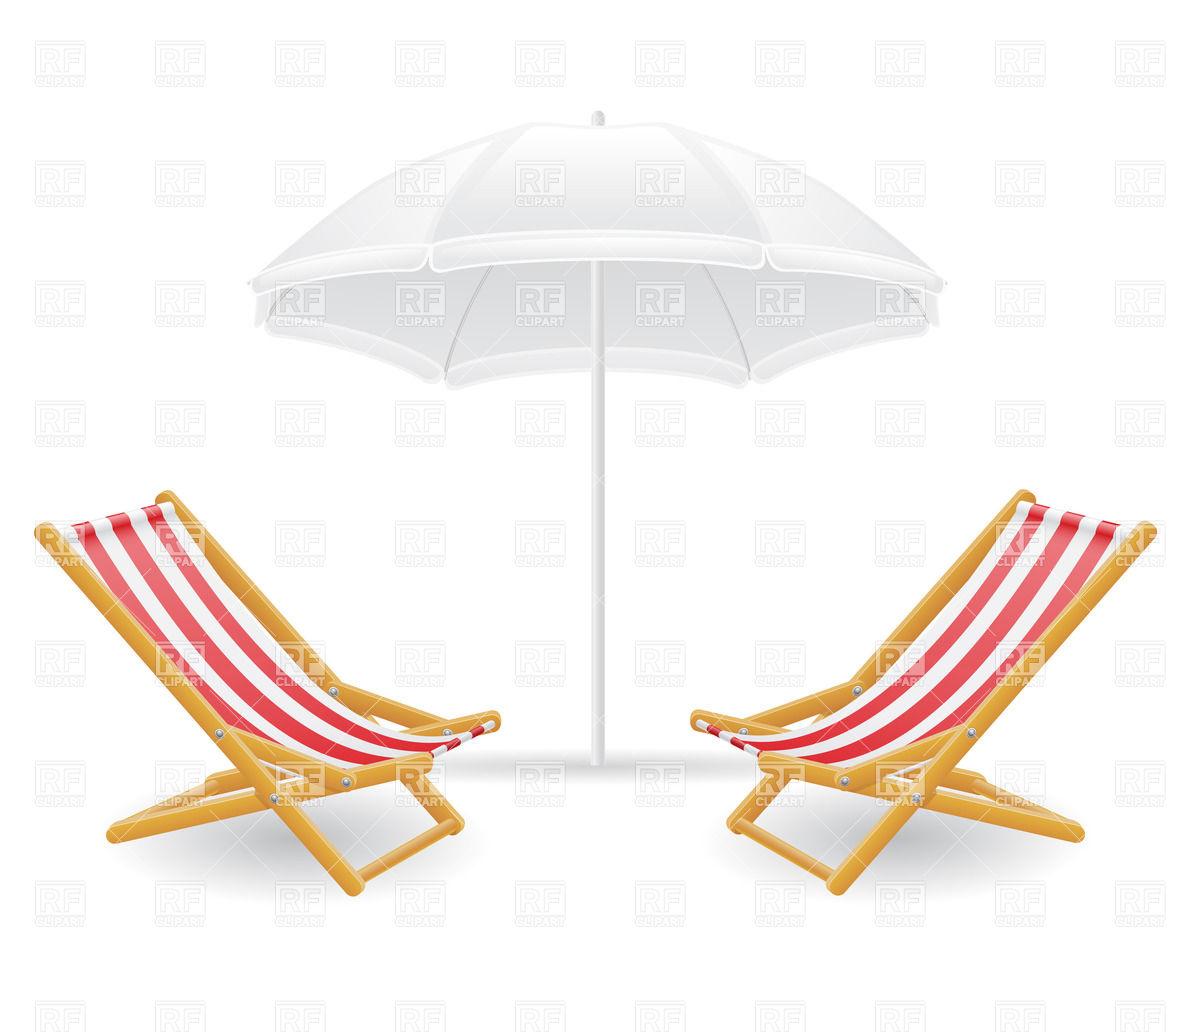 1200x1032 Striped Beach Chair (Chaise Longue) And Sunshade Royalty Free